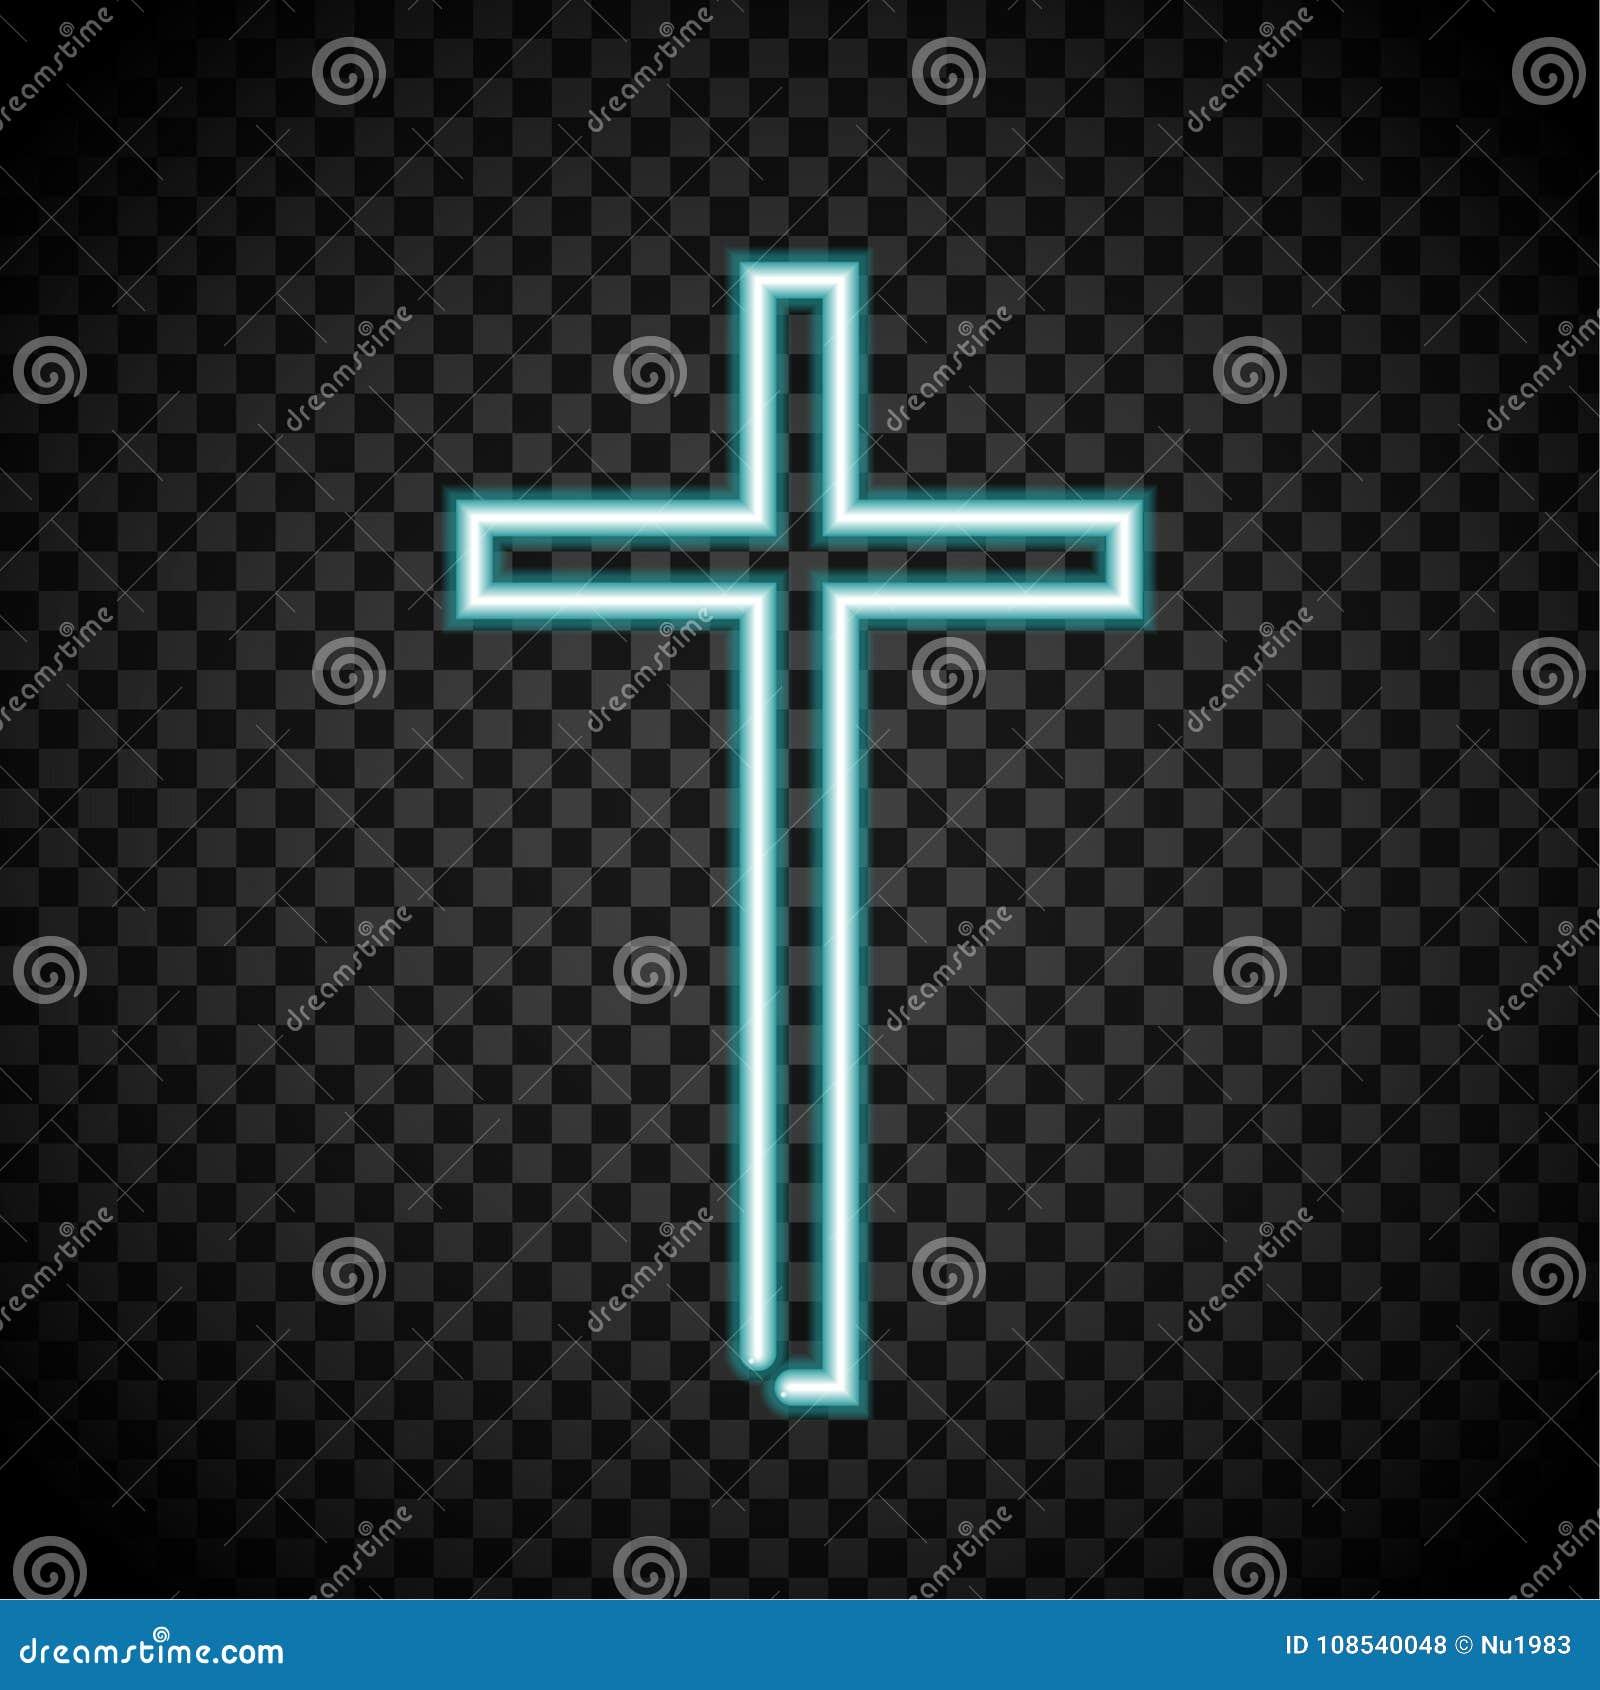 Neon dwars, gloeiend kruis, godsdienst, Christendom, de kruisen van Jesus